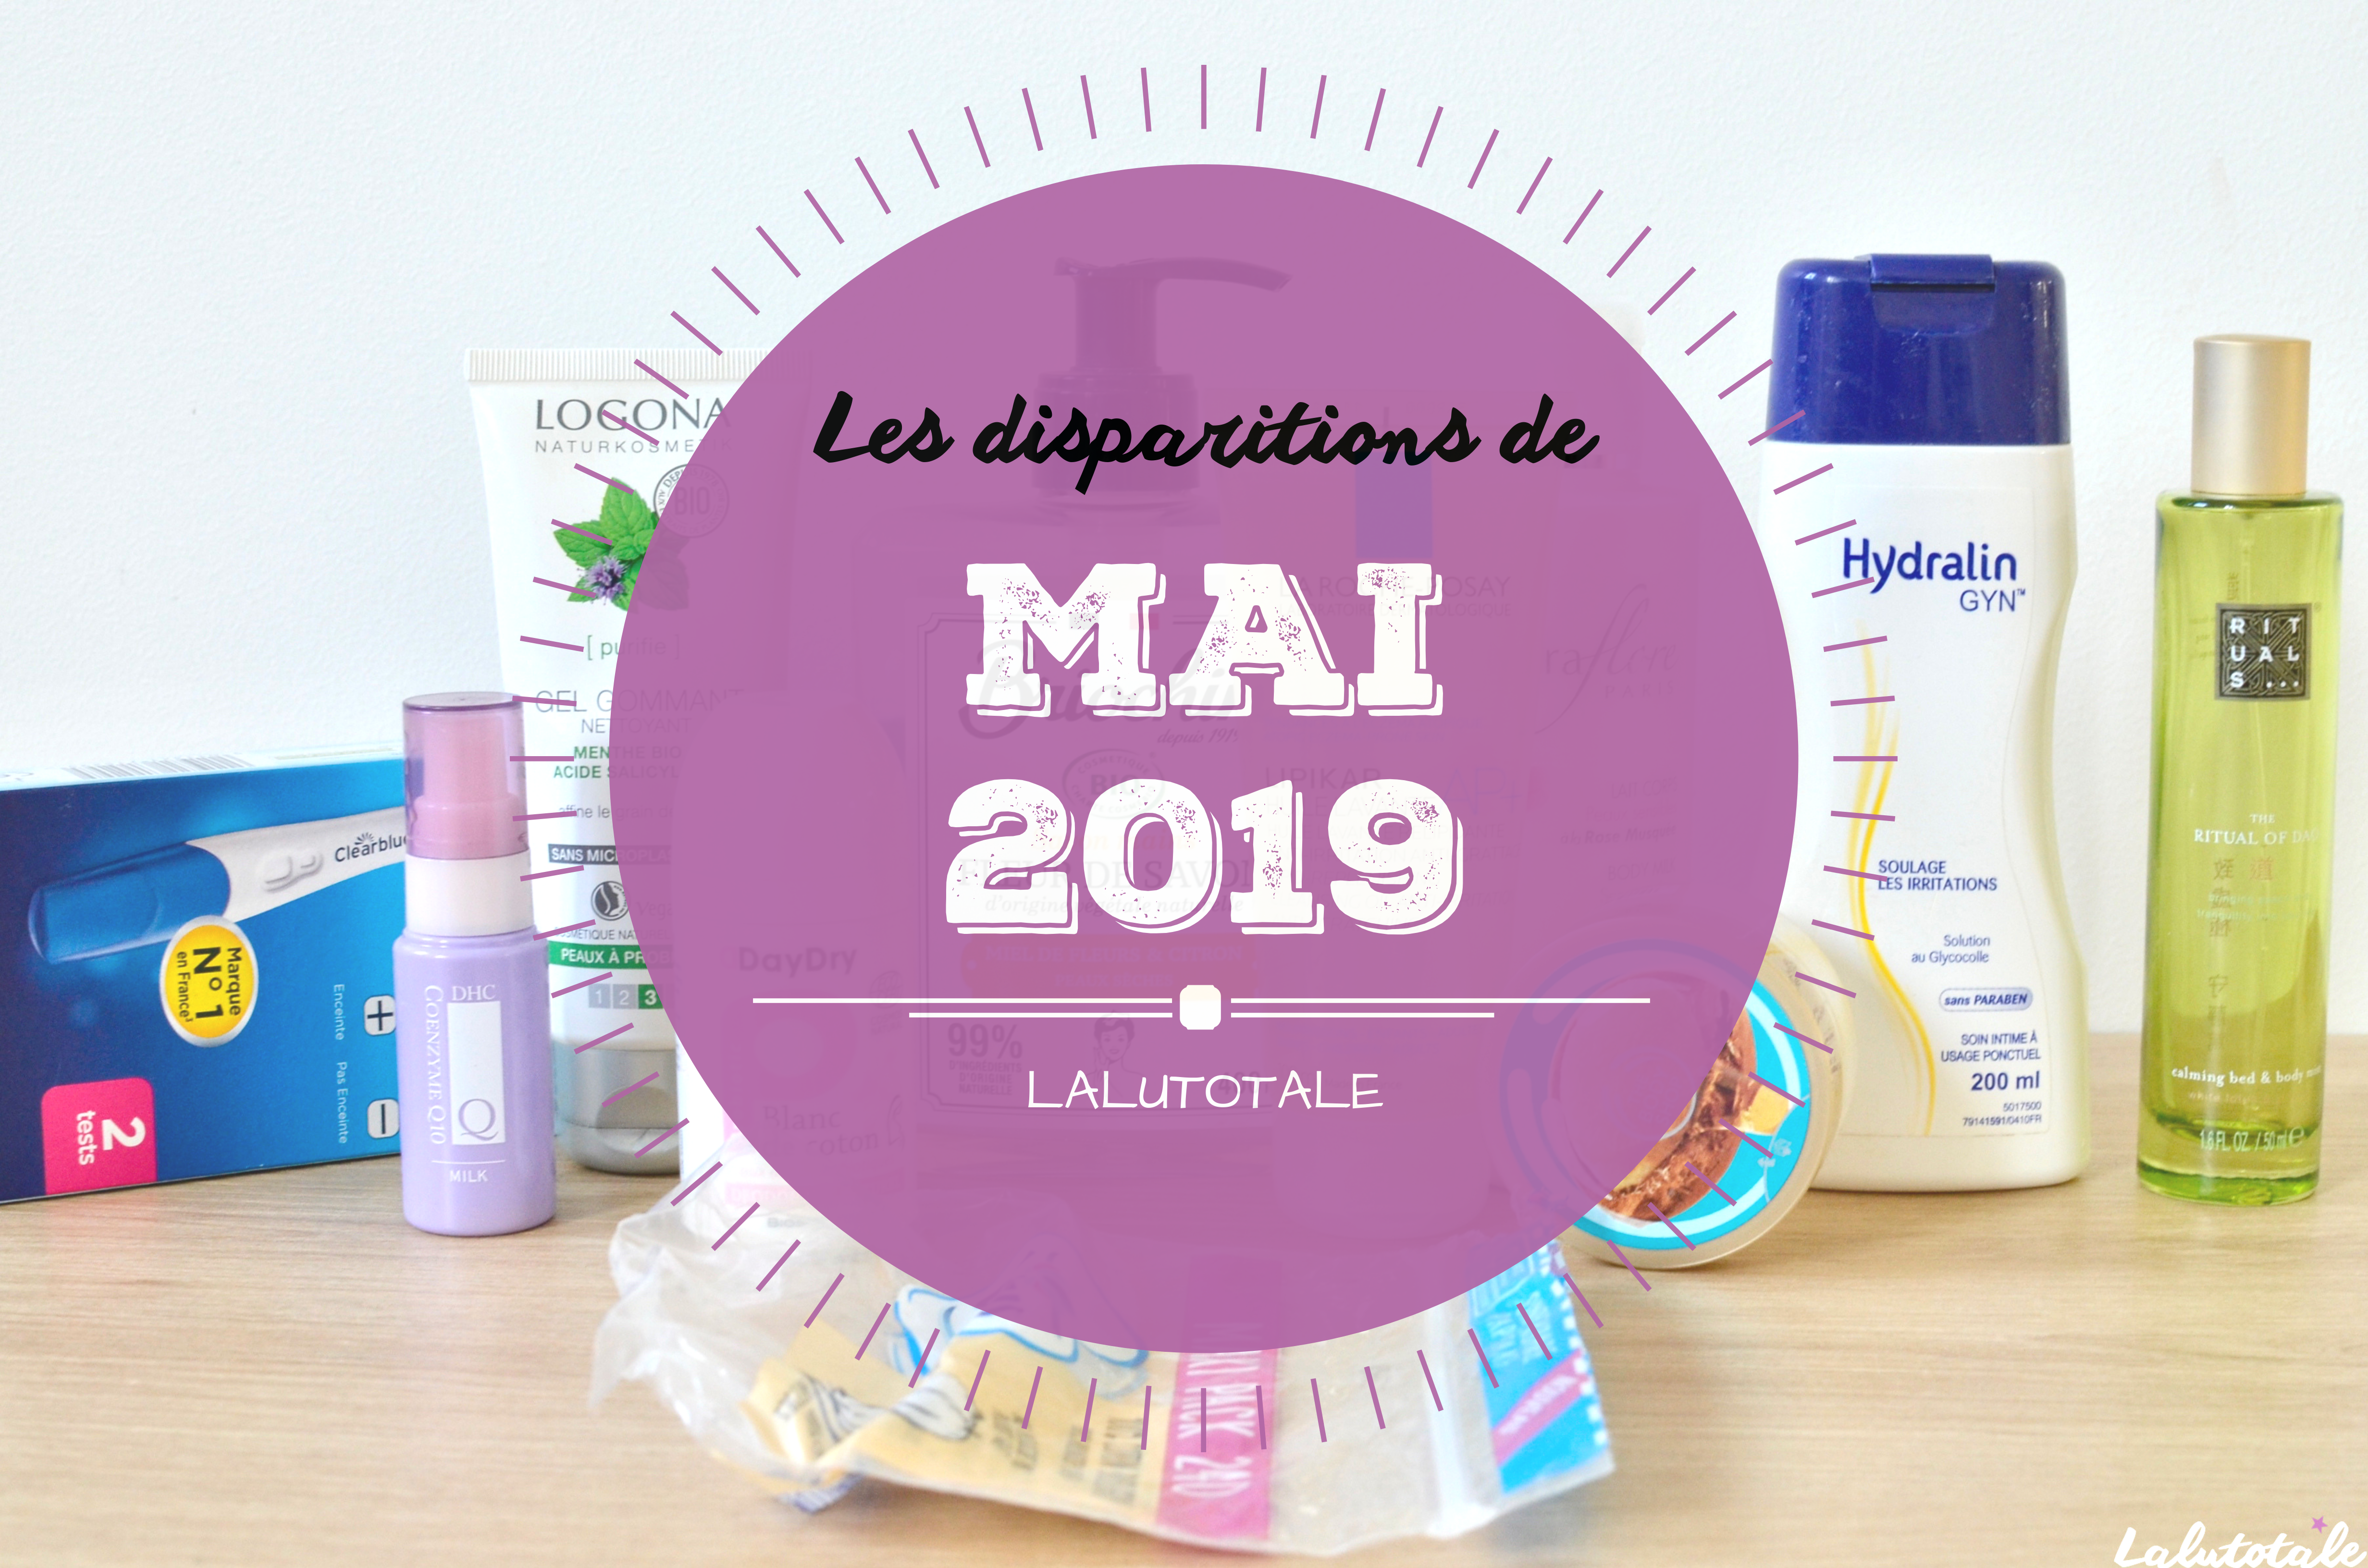 ✞ Les disparitions de Mai 2019 ✞